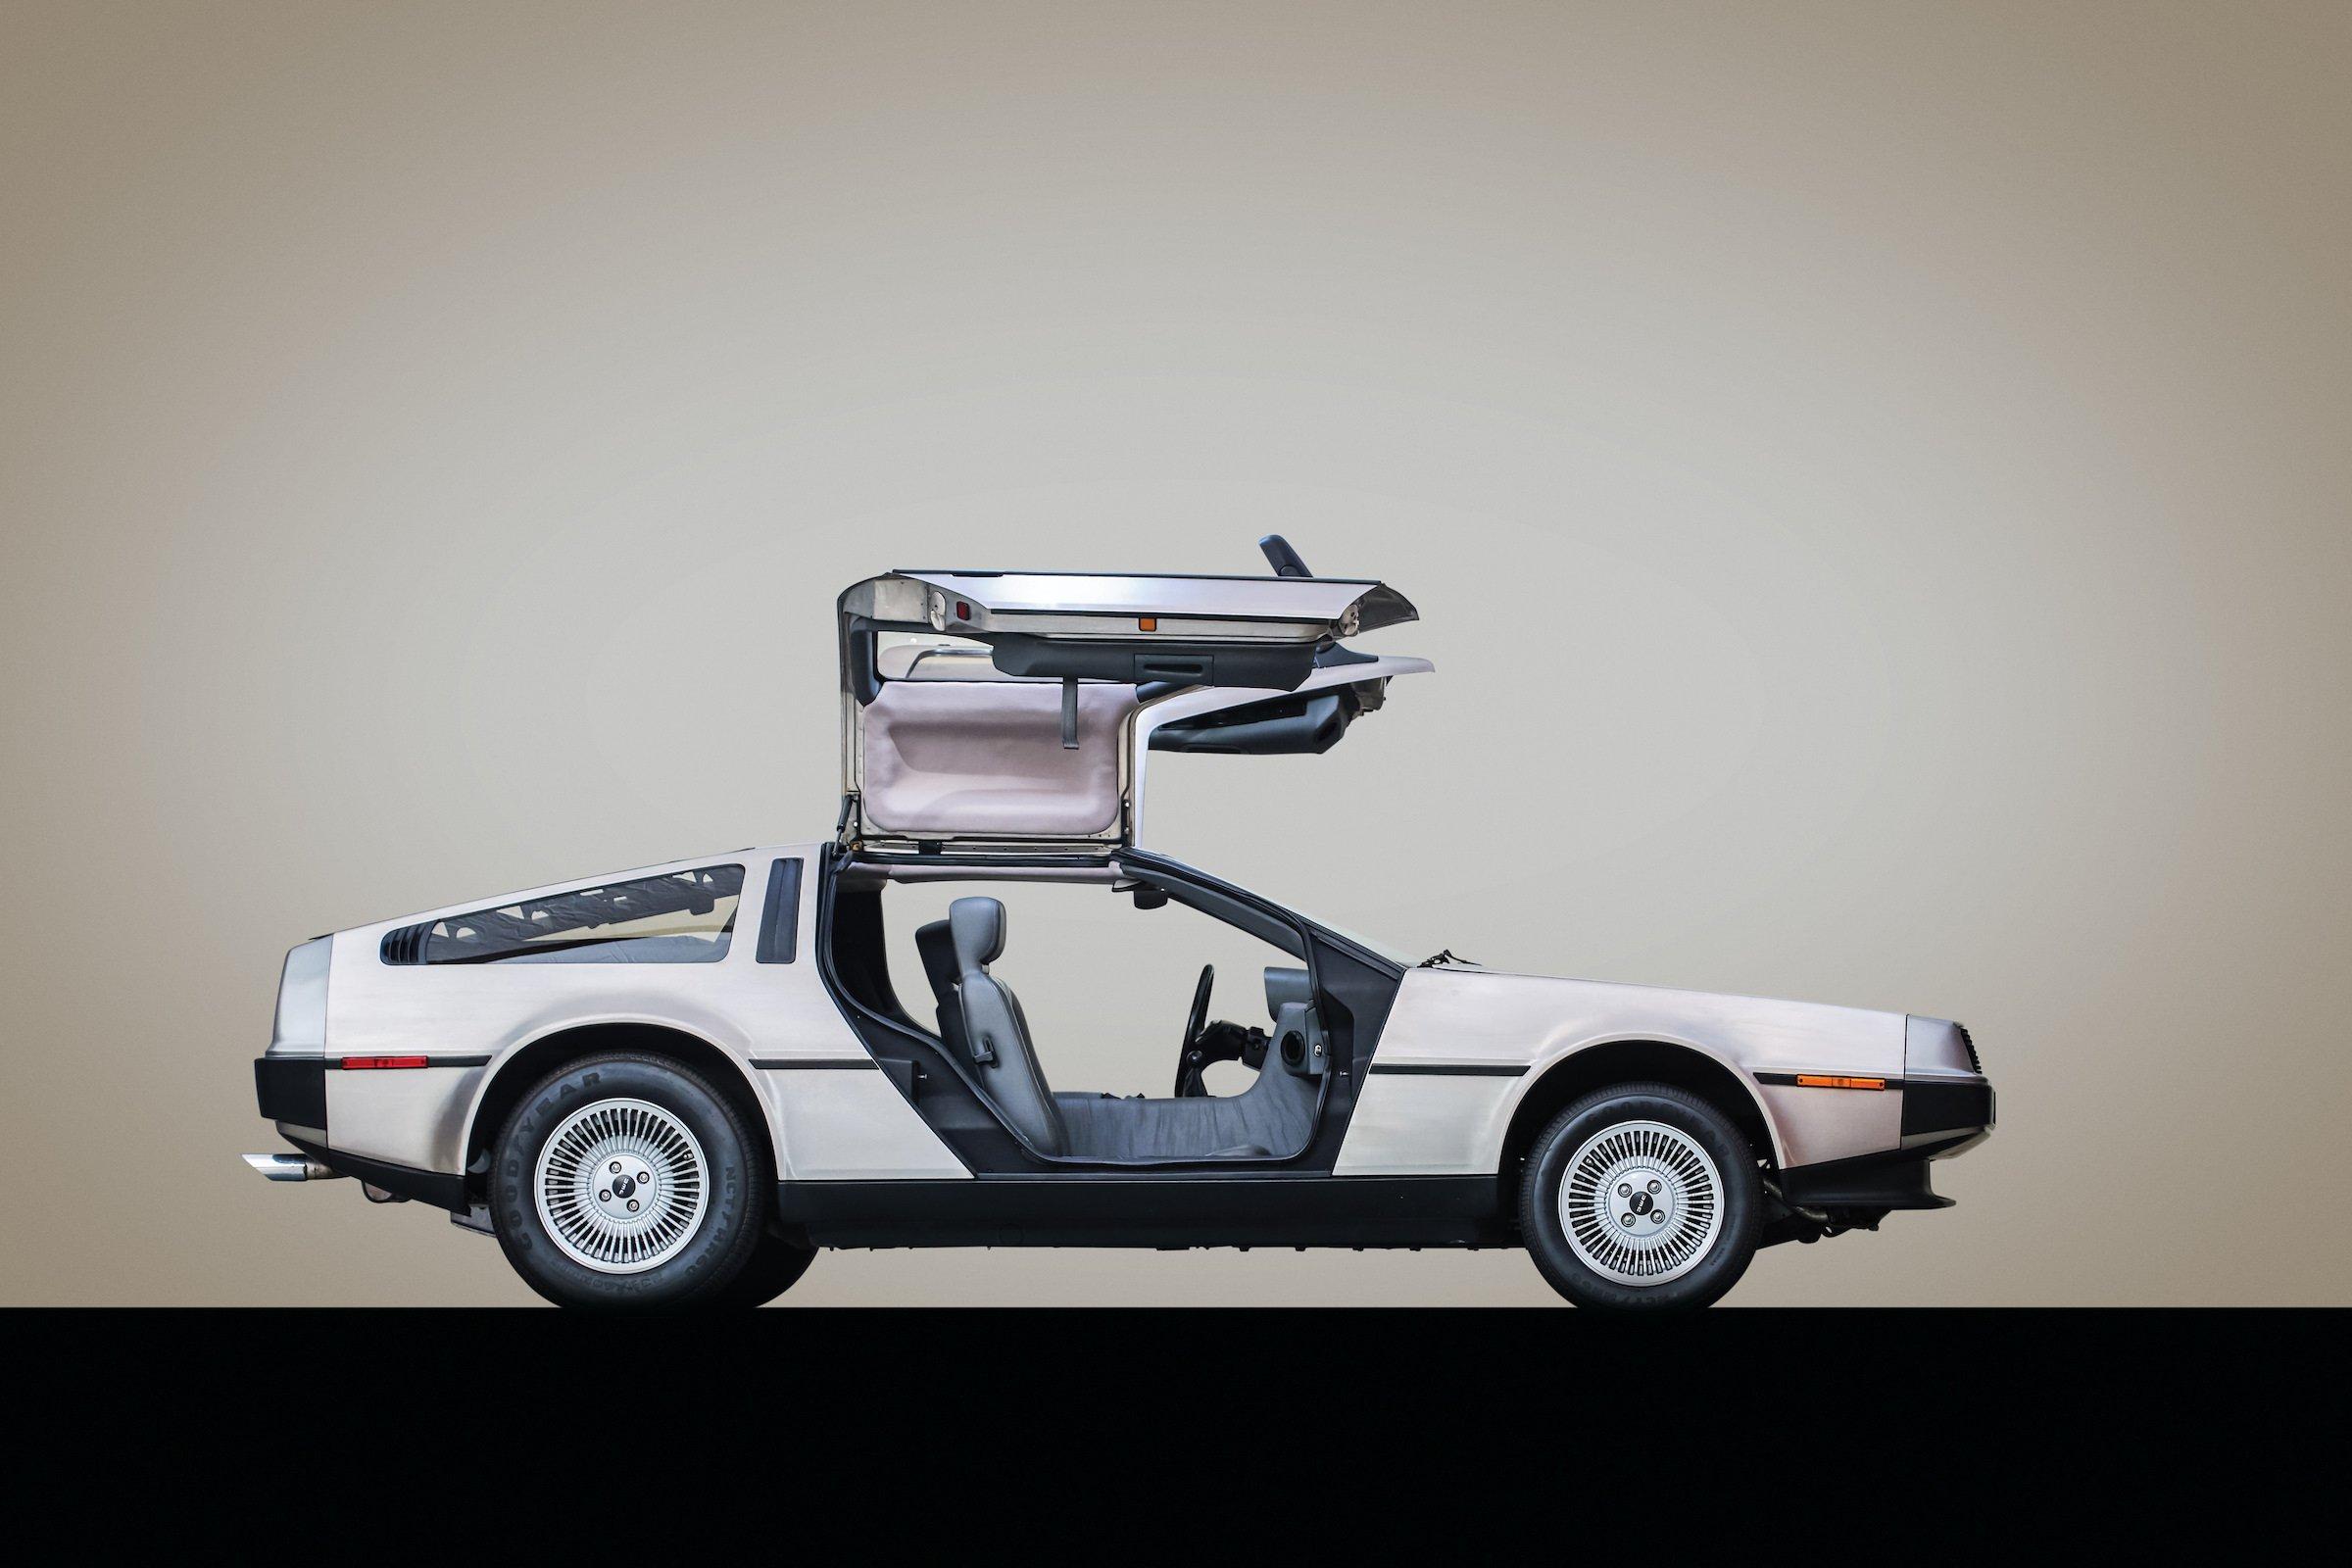 DeLorean DMC-12 Turbo Side